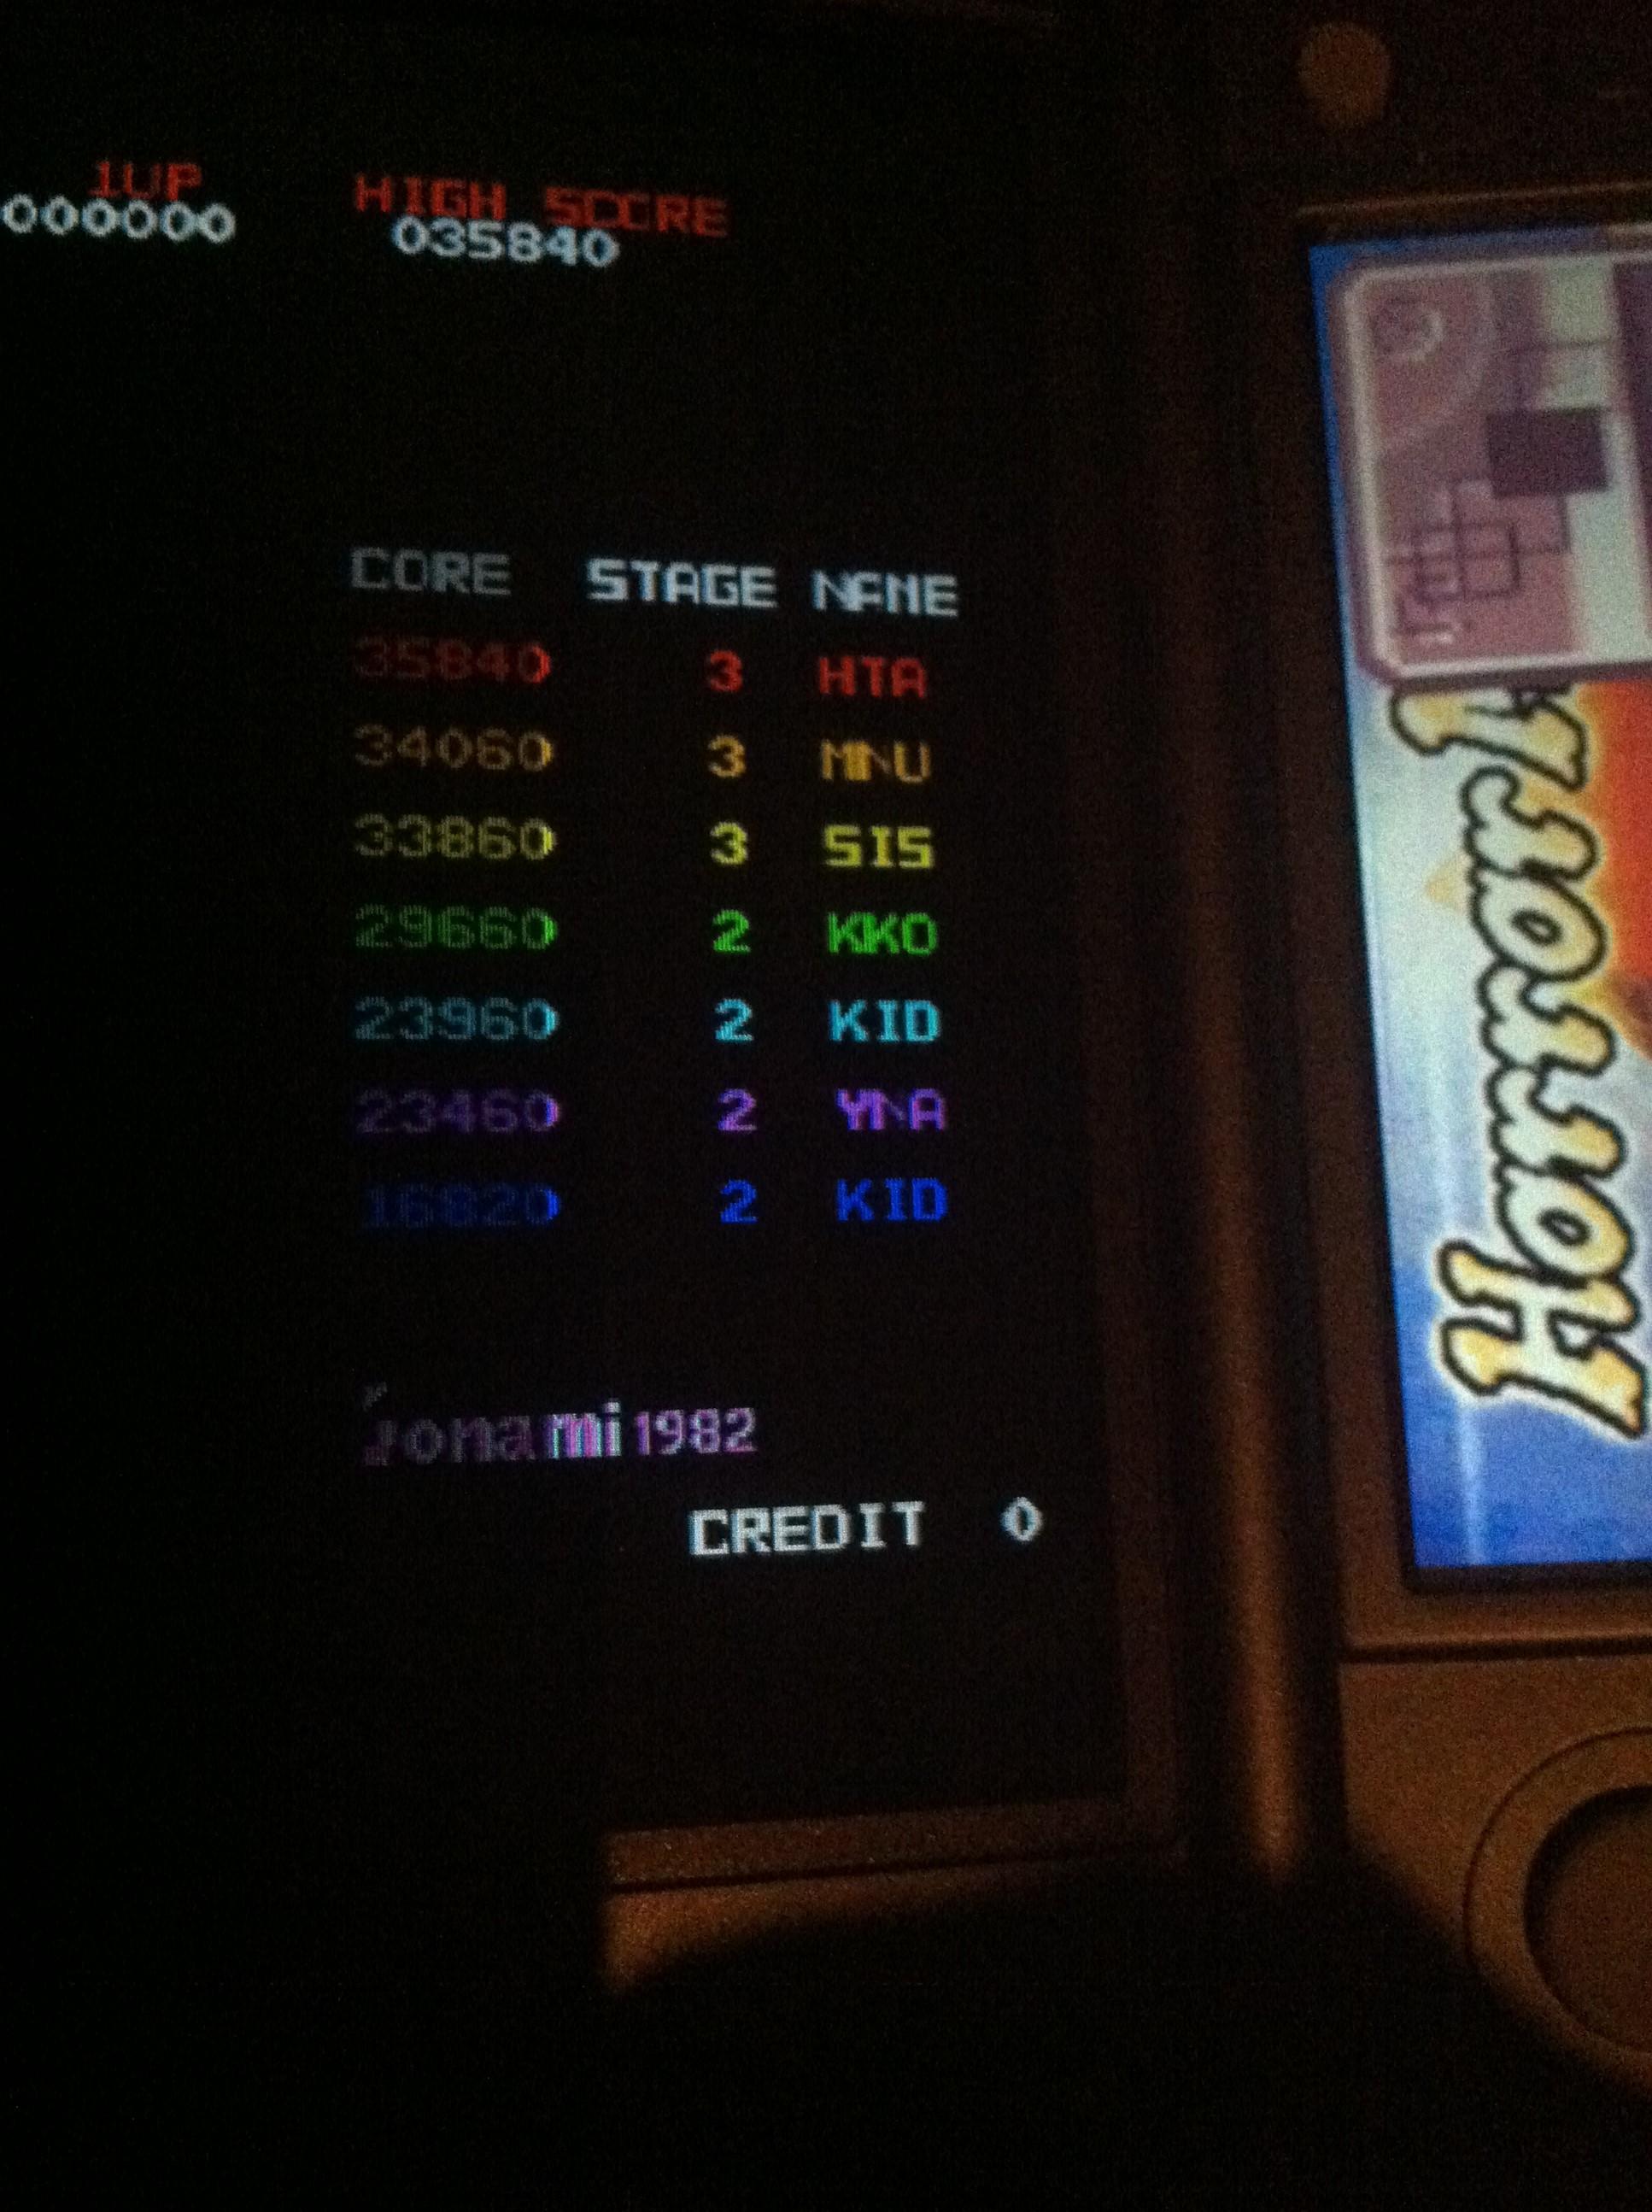 Konami Classics Series: Arcade Hits: Tutankham / Horror Maze 23,960 points